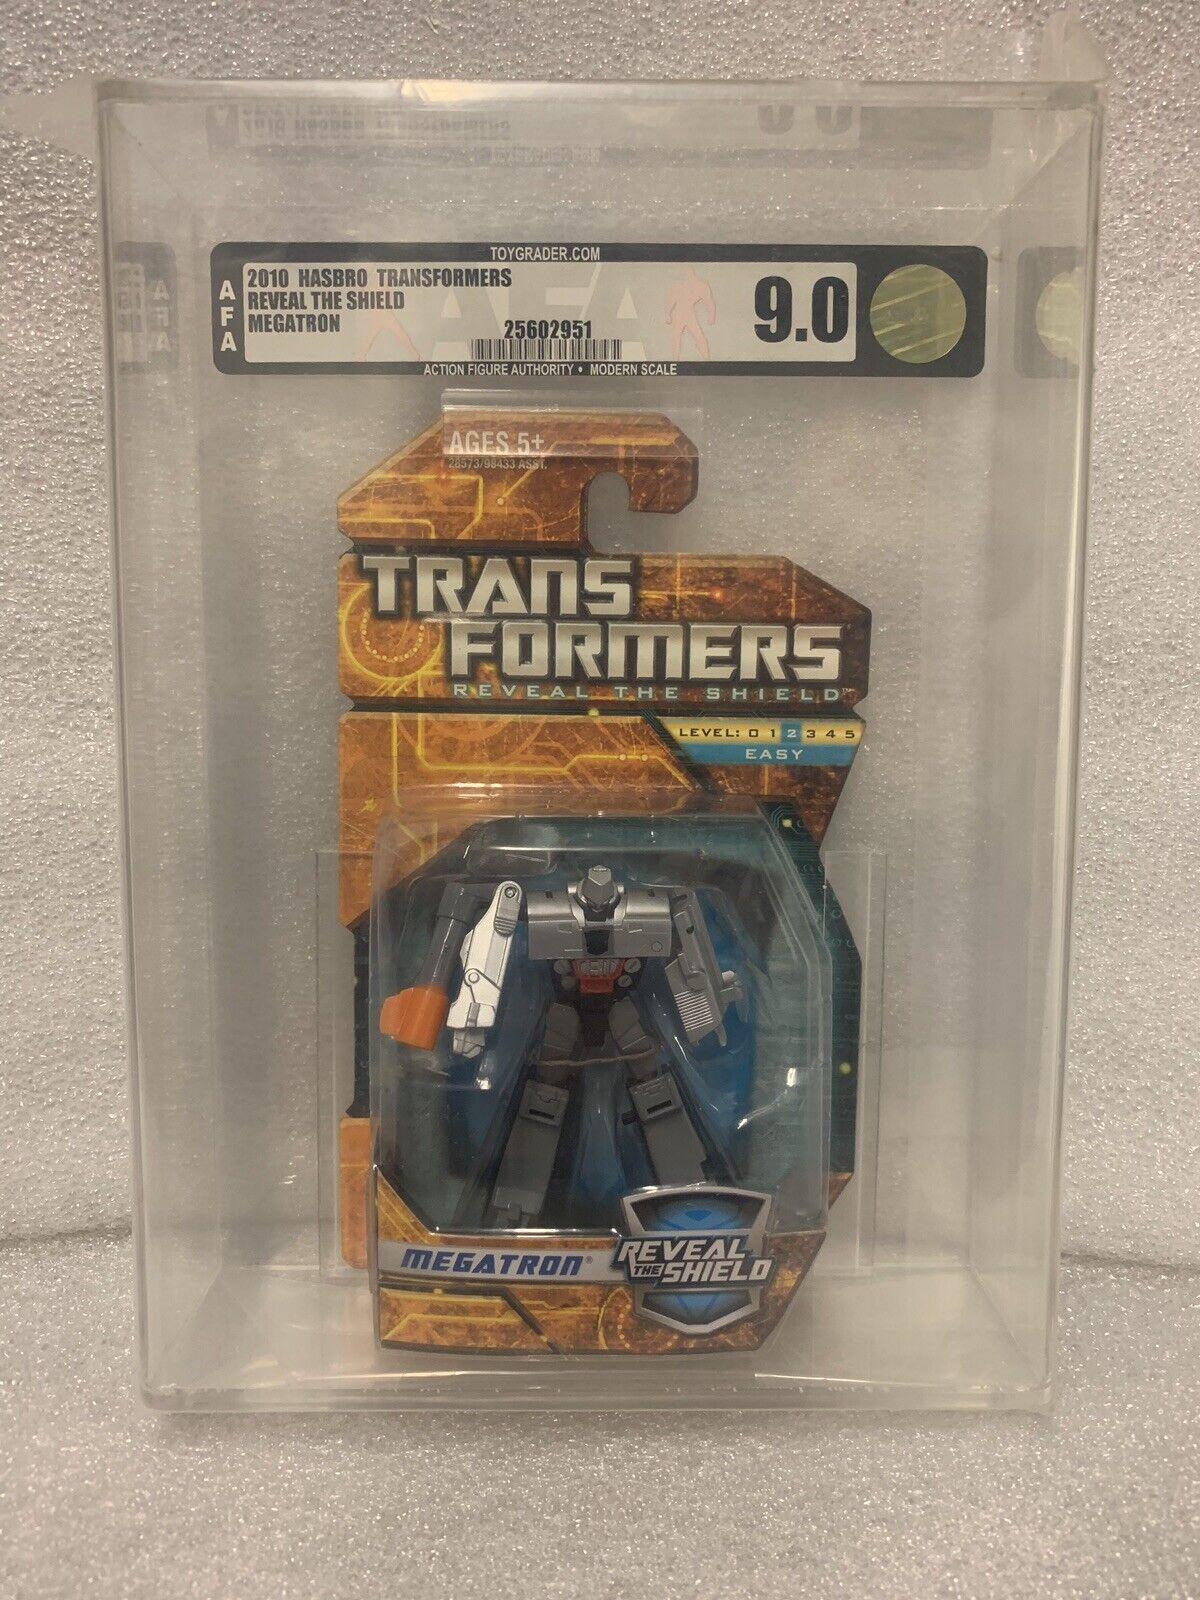 2010 Hasbro Transformers Transformers Transformers Reveal The Shield Megatron G1 AFA Graded 9.0 d91